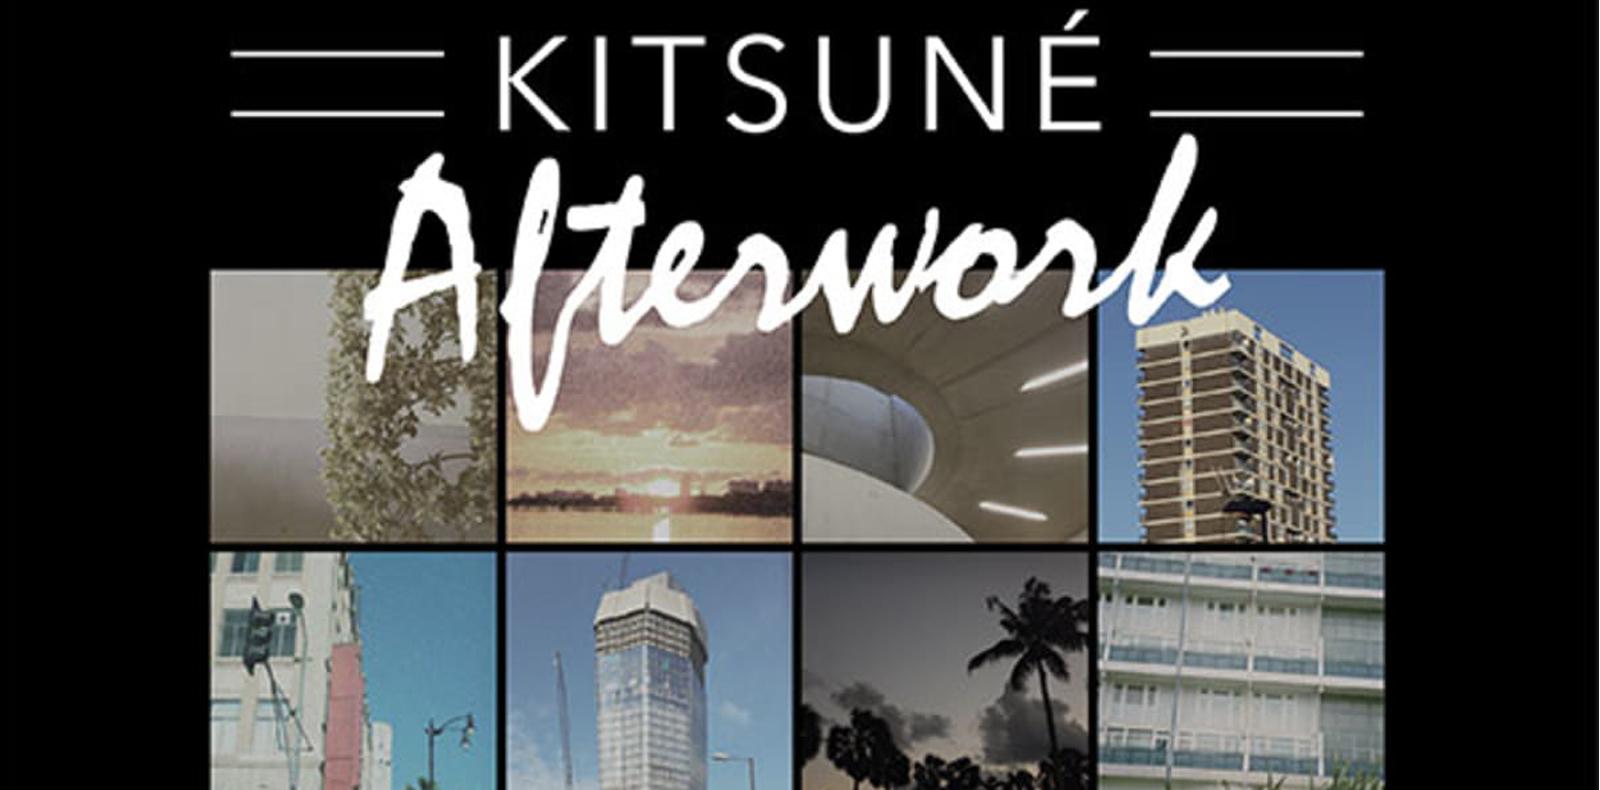 Kitsuné Afterwork Vol. 1